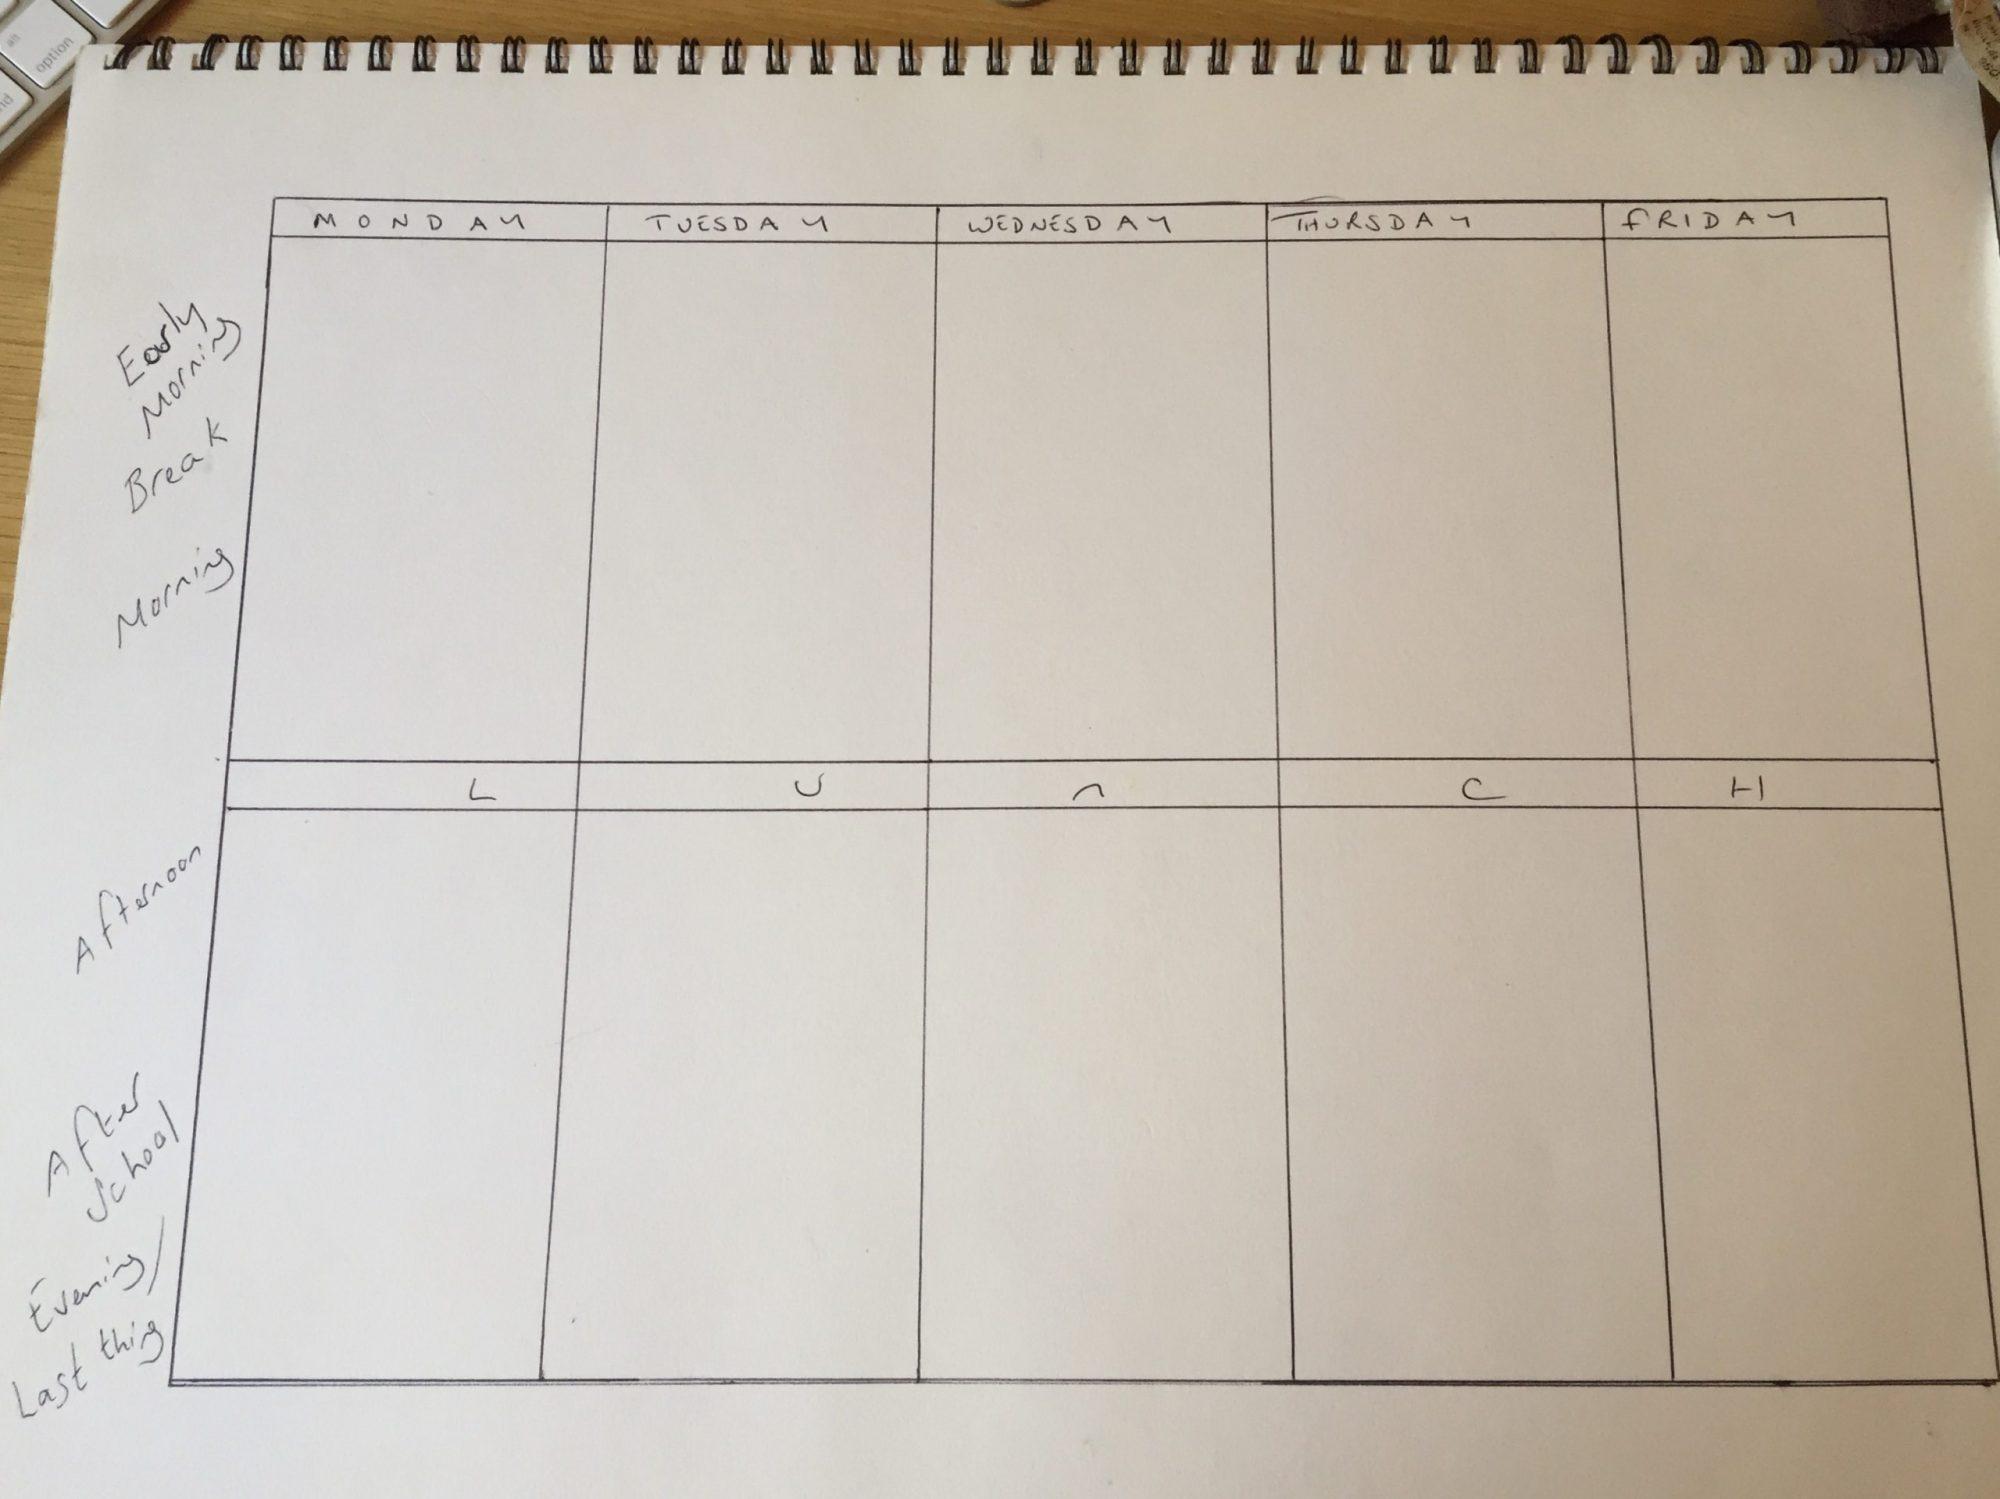 Hand drawn timetable